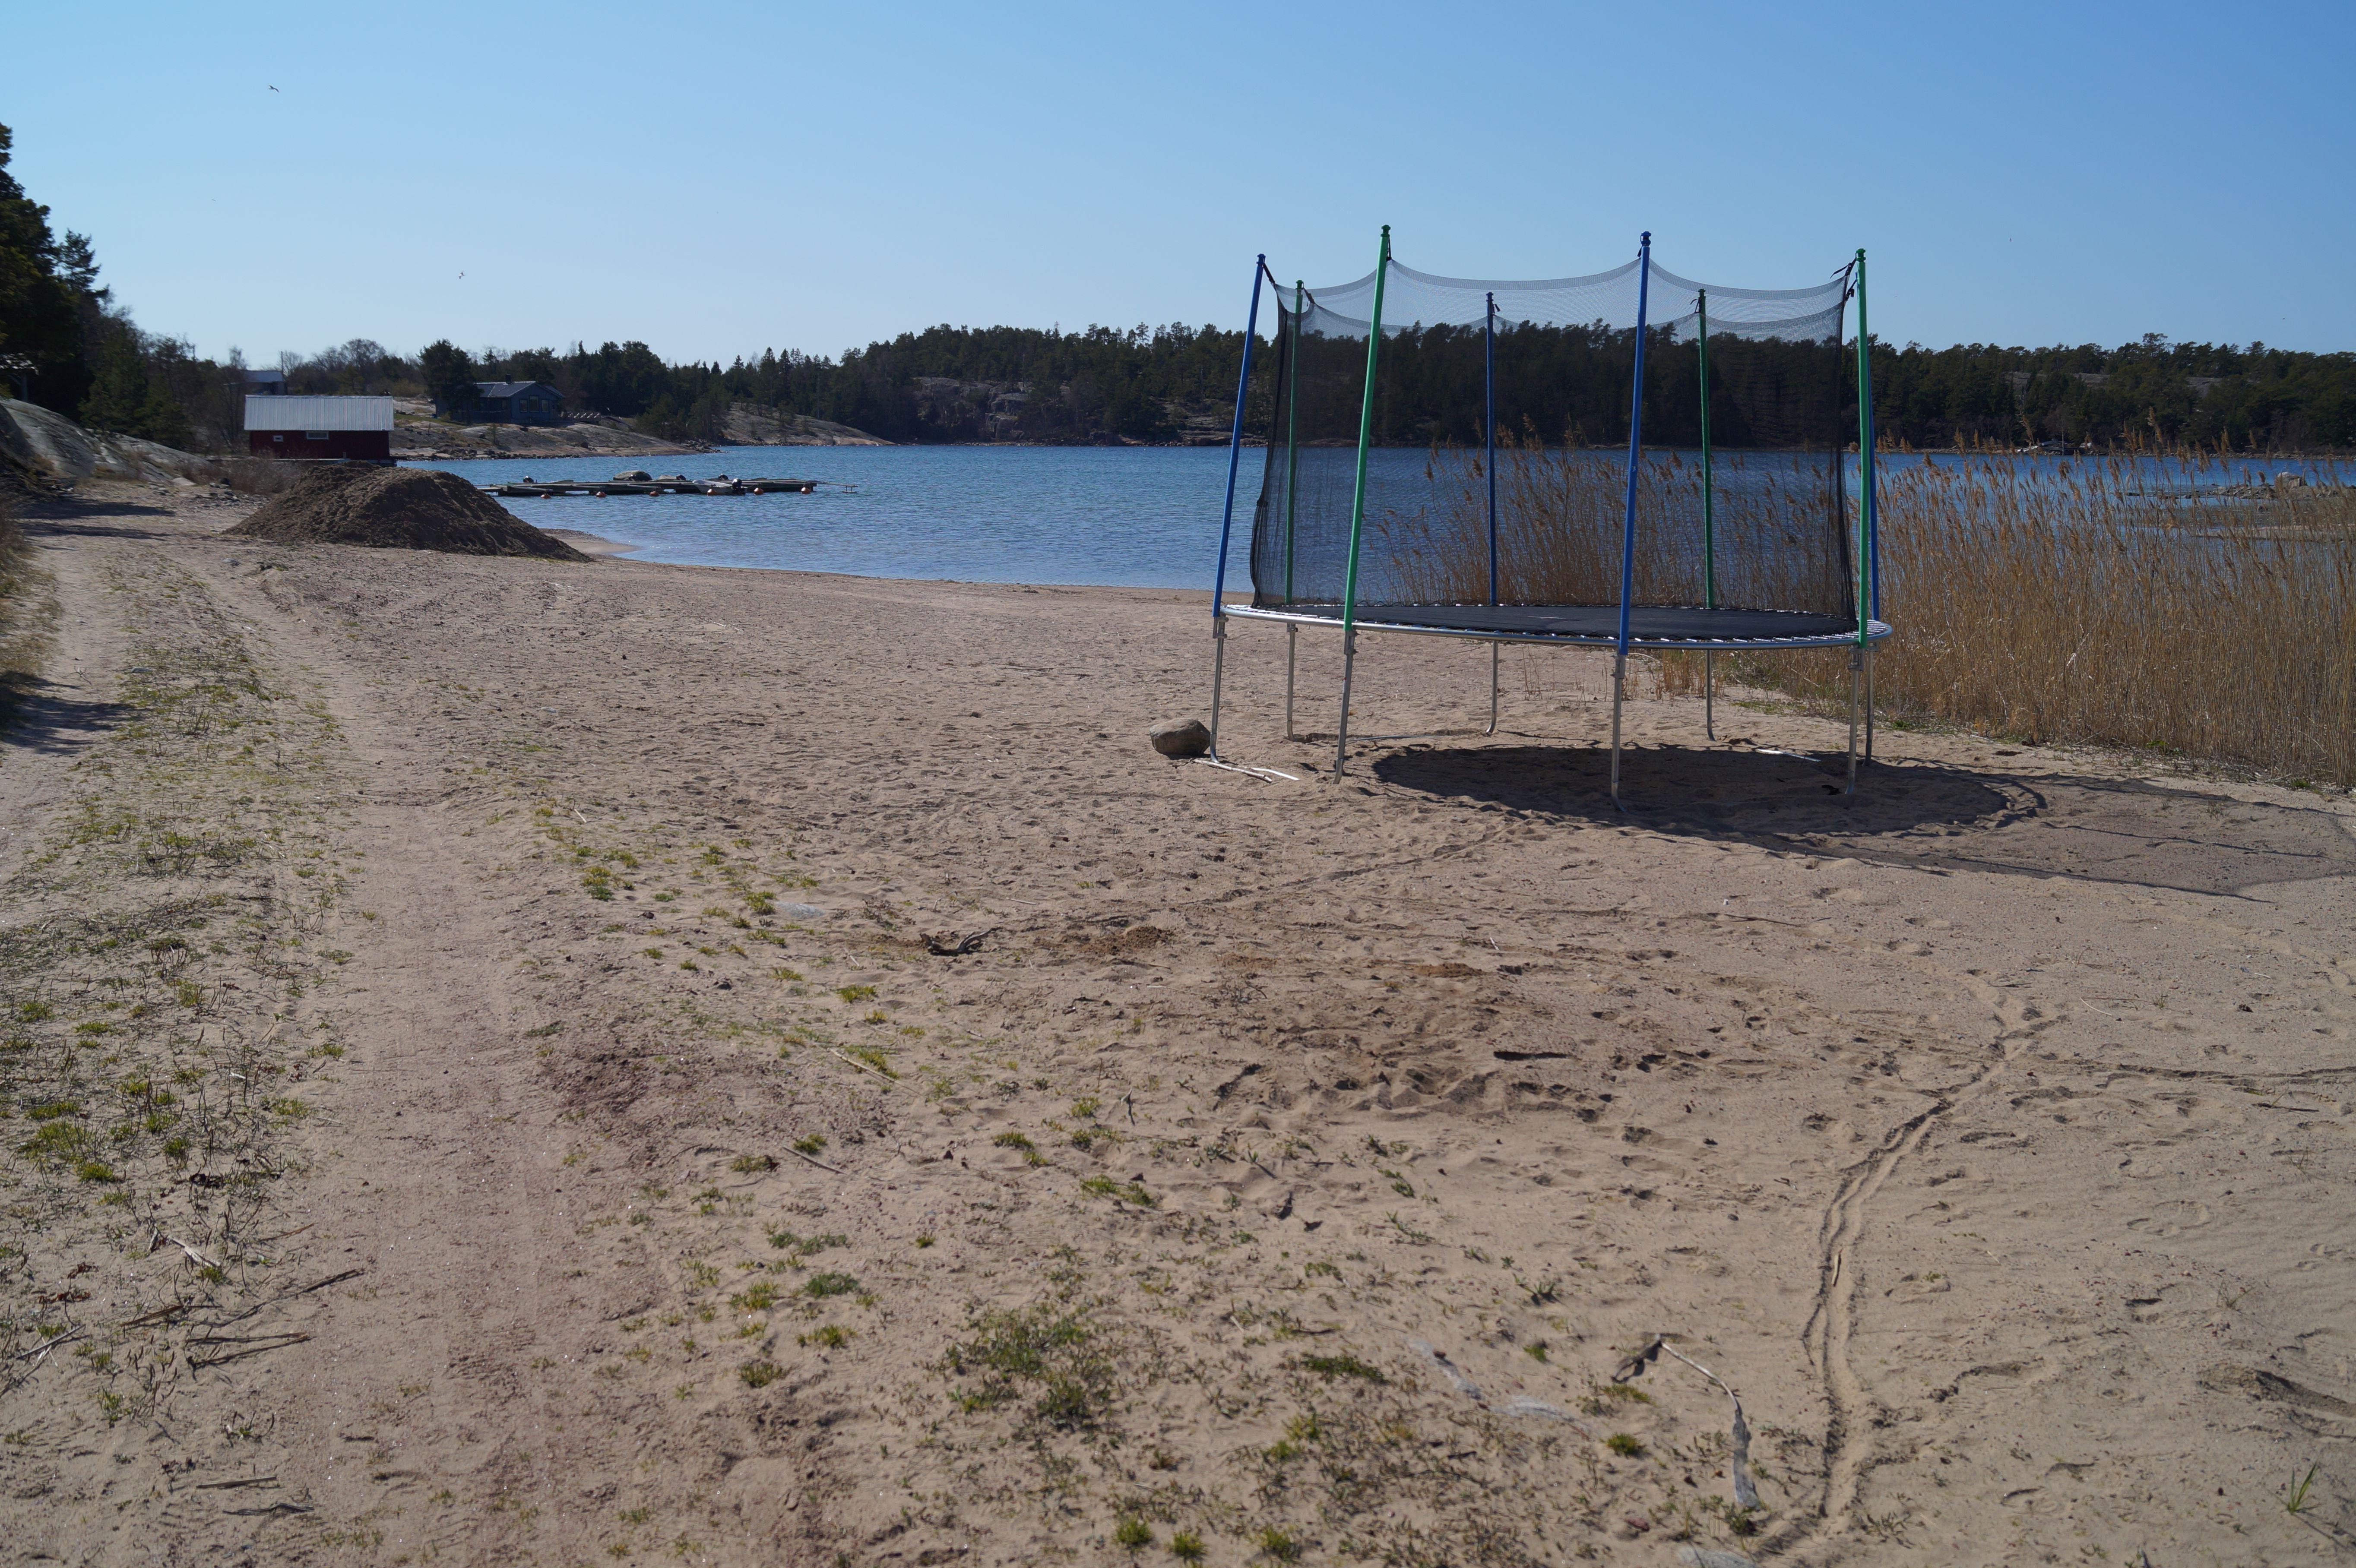 Dånö beach villas